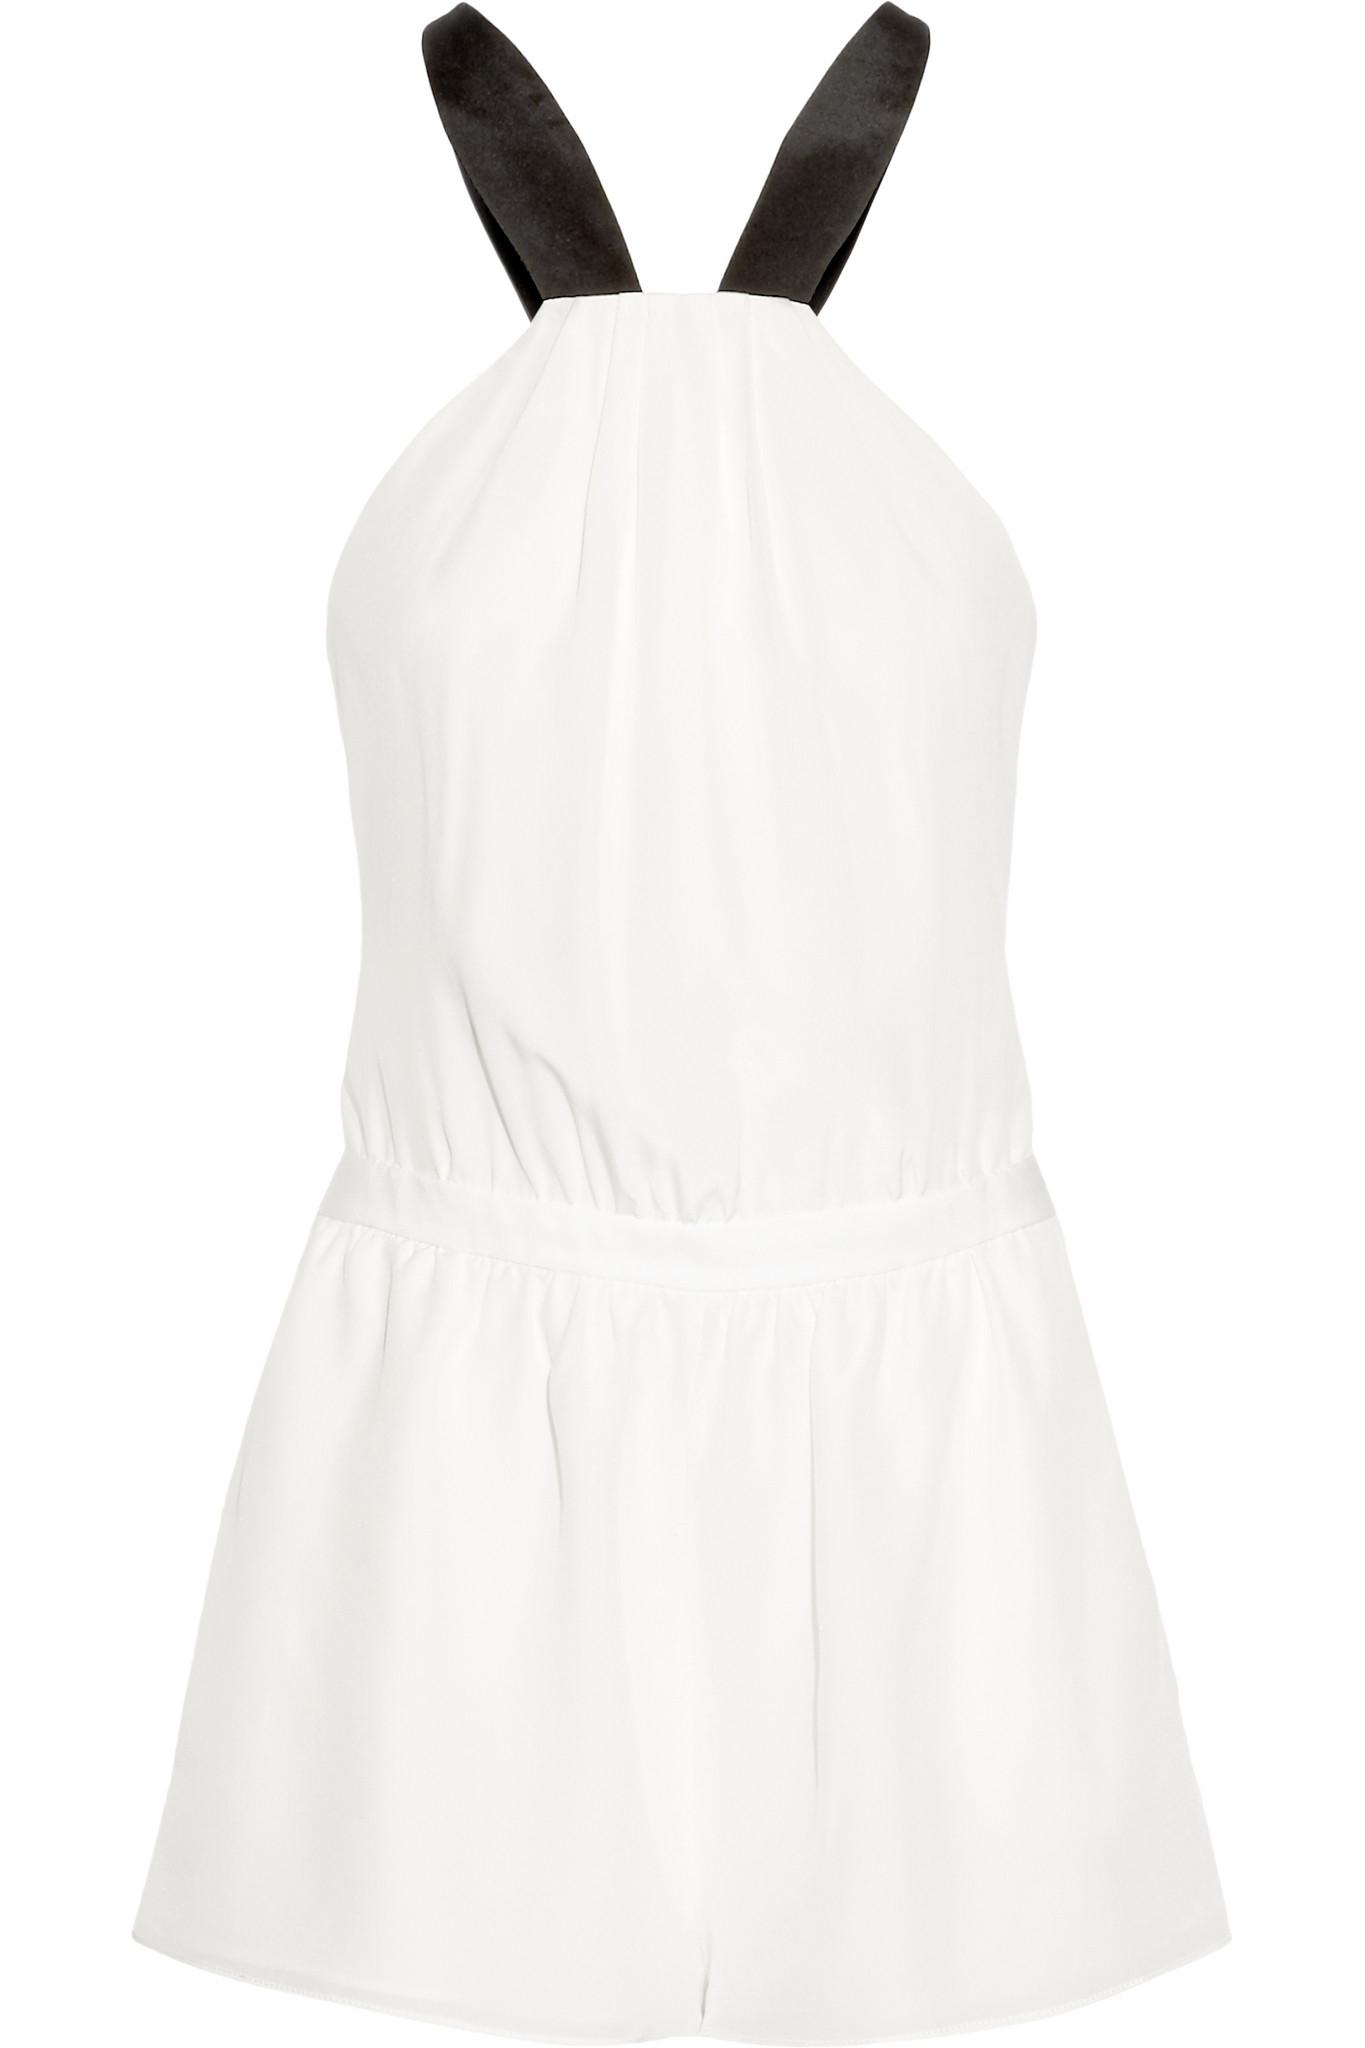 c6a27984fb5 Lyst - Fleur du Mal + Playboy Silk Crepe De Chine Playsuit in White